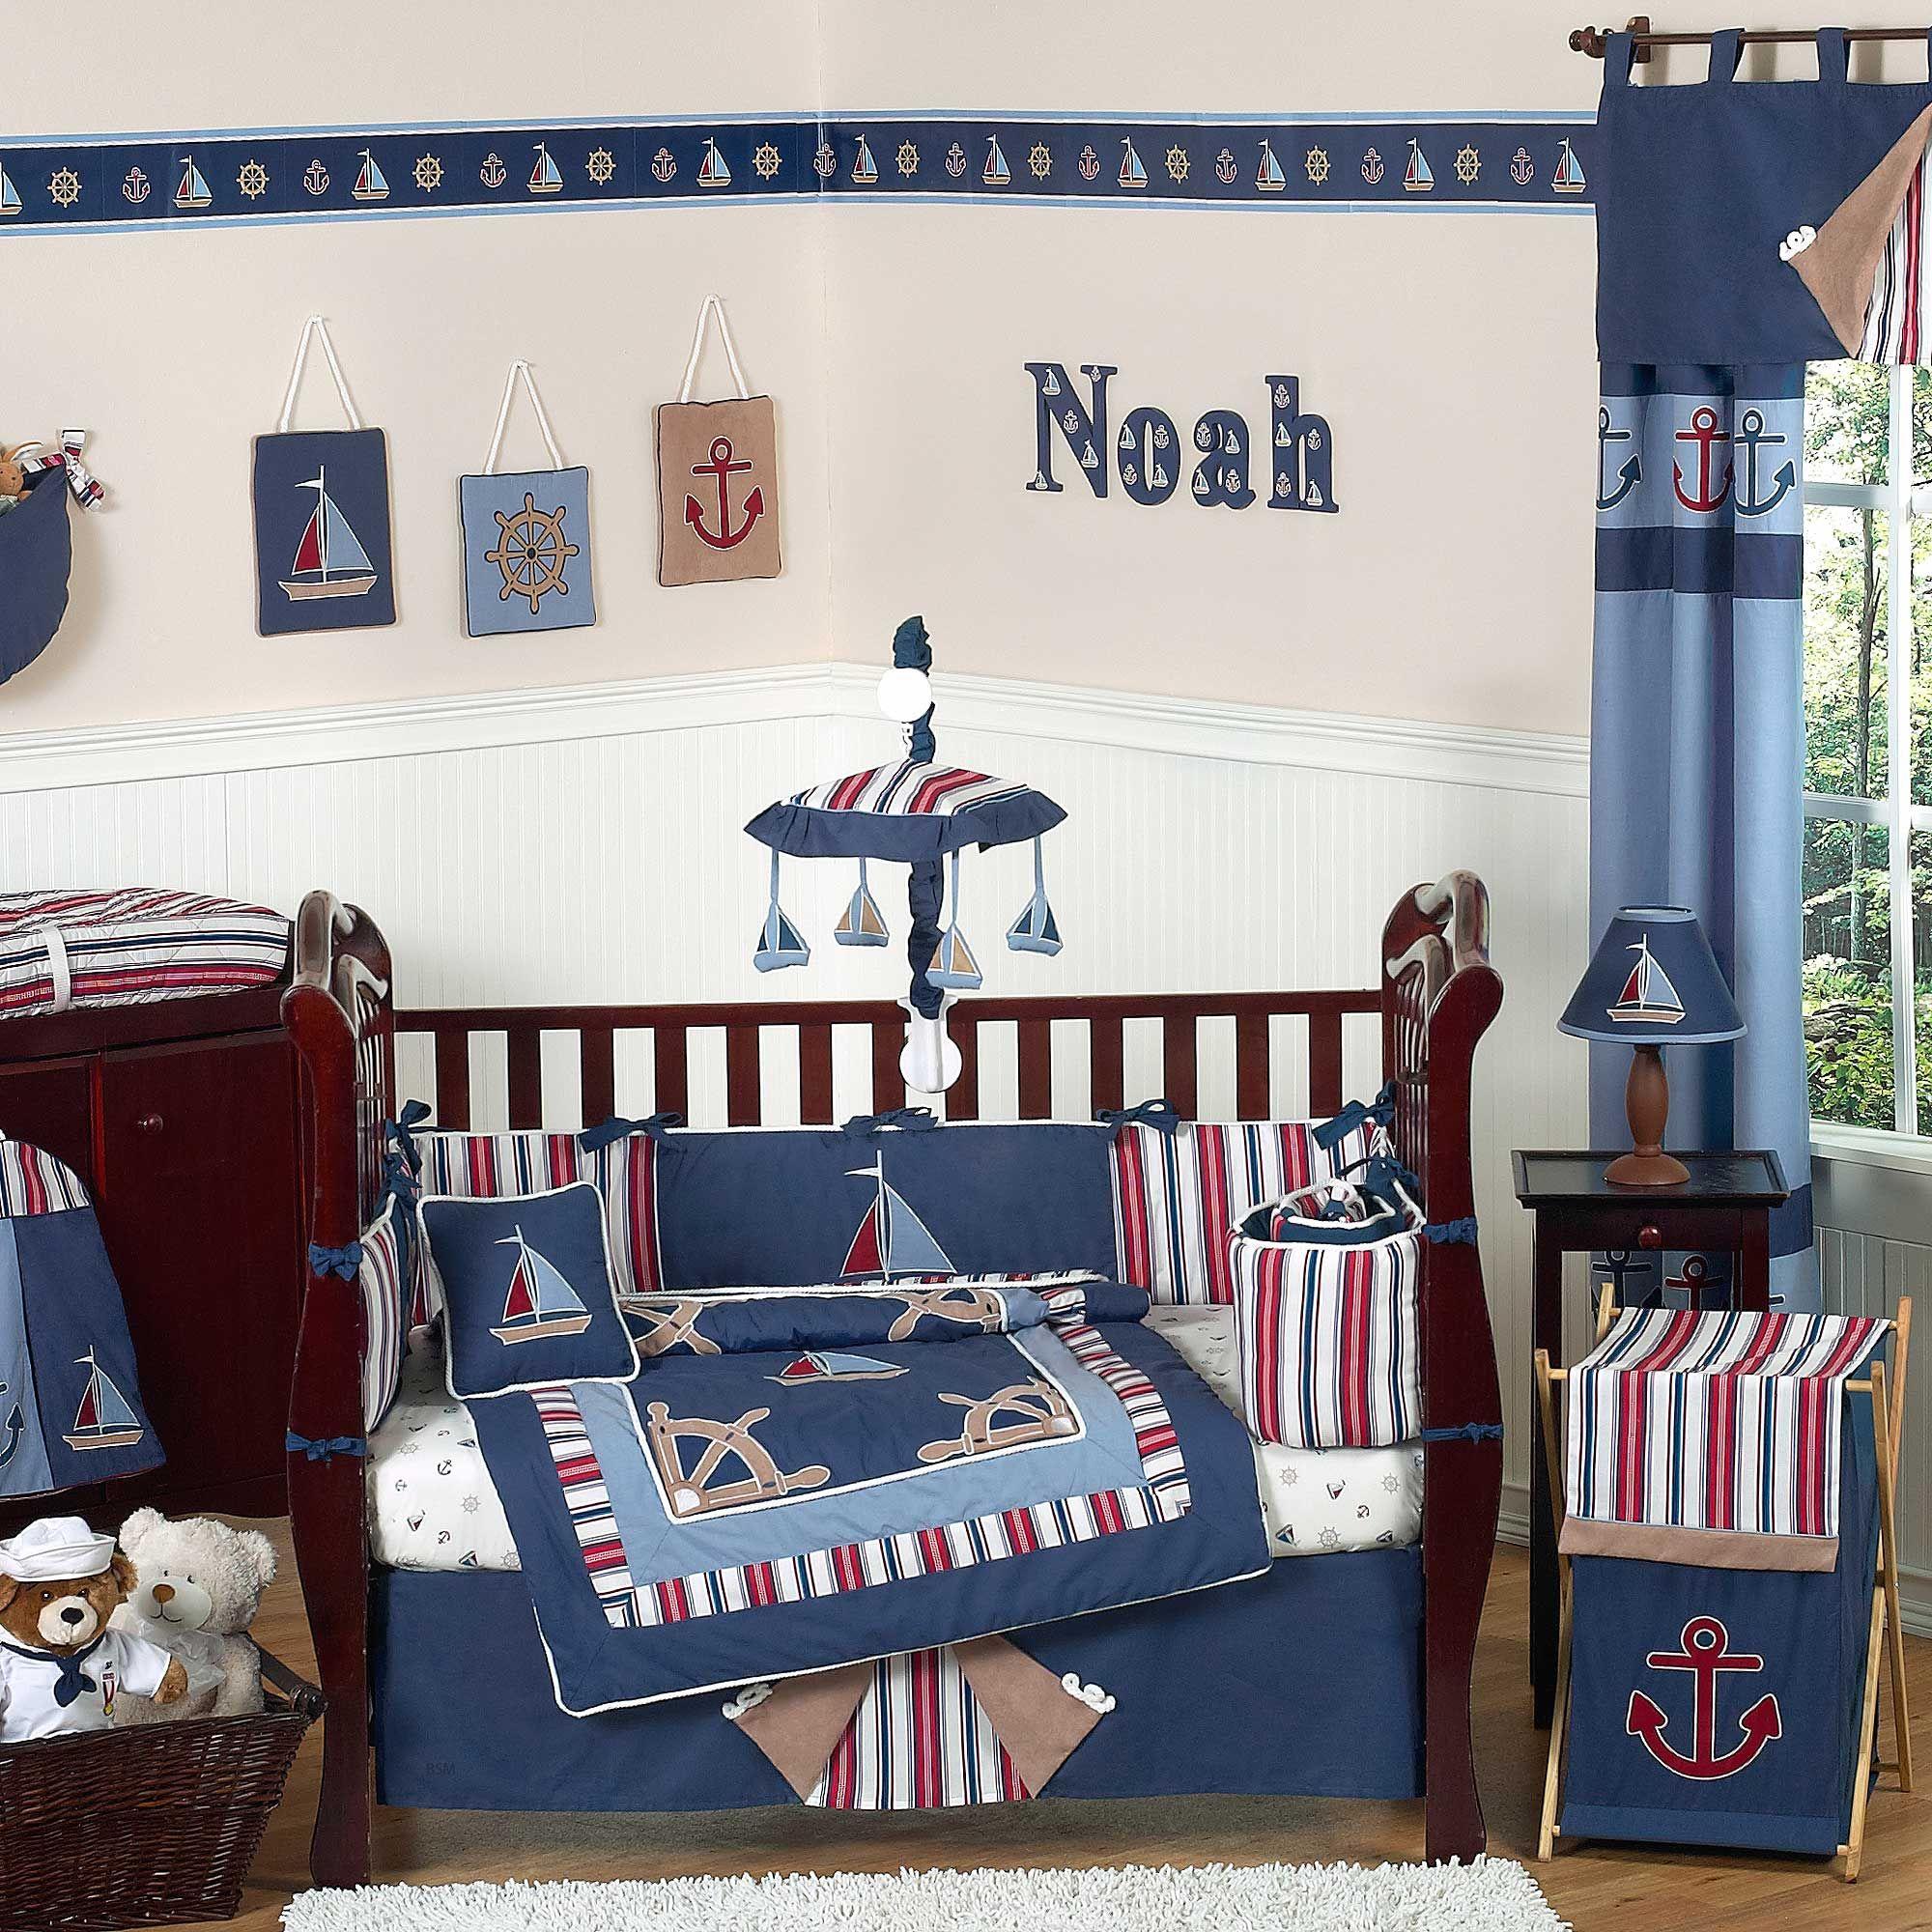 for piece tokida rabbit jojo bedding set robot designs nursery crib sweet cribs